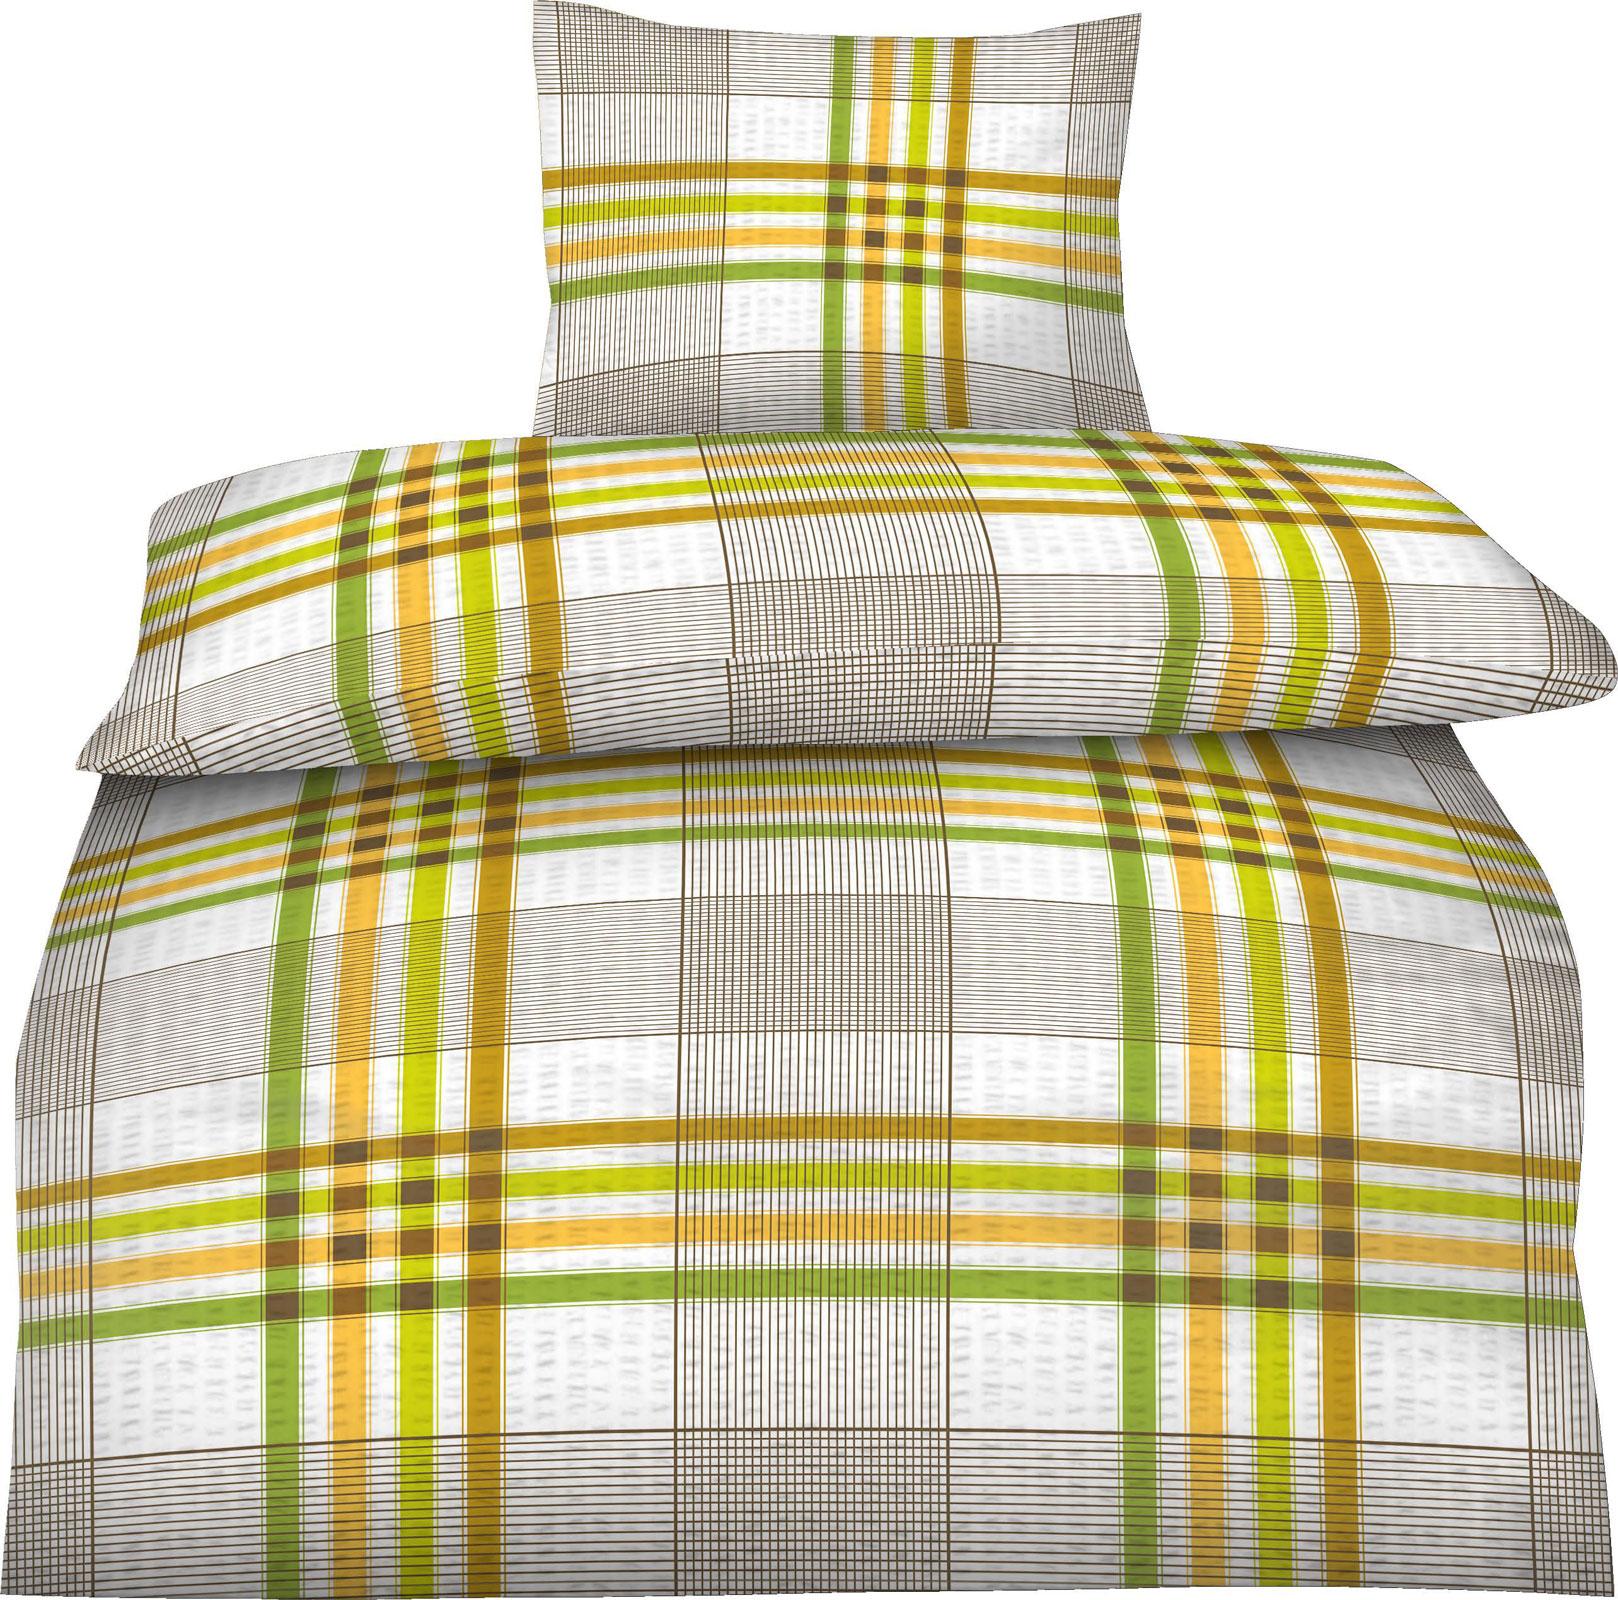 seersucker bettw sche baumwolle 135x200 80x80 art 418030 ebay. Black Bedroom Furniture Sets. Home Design Ideas